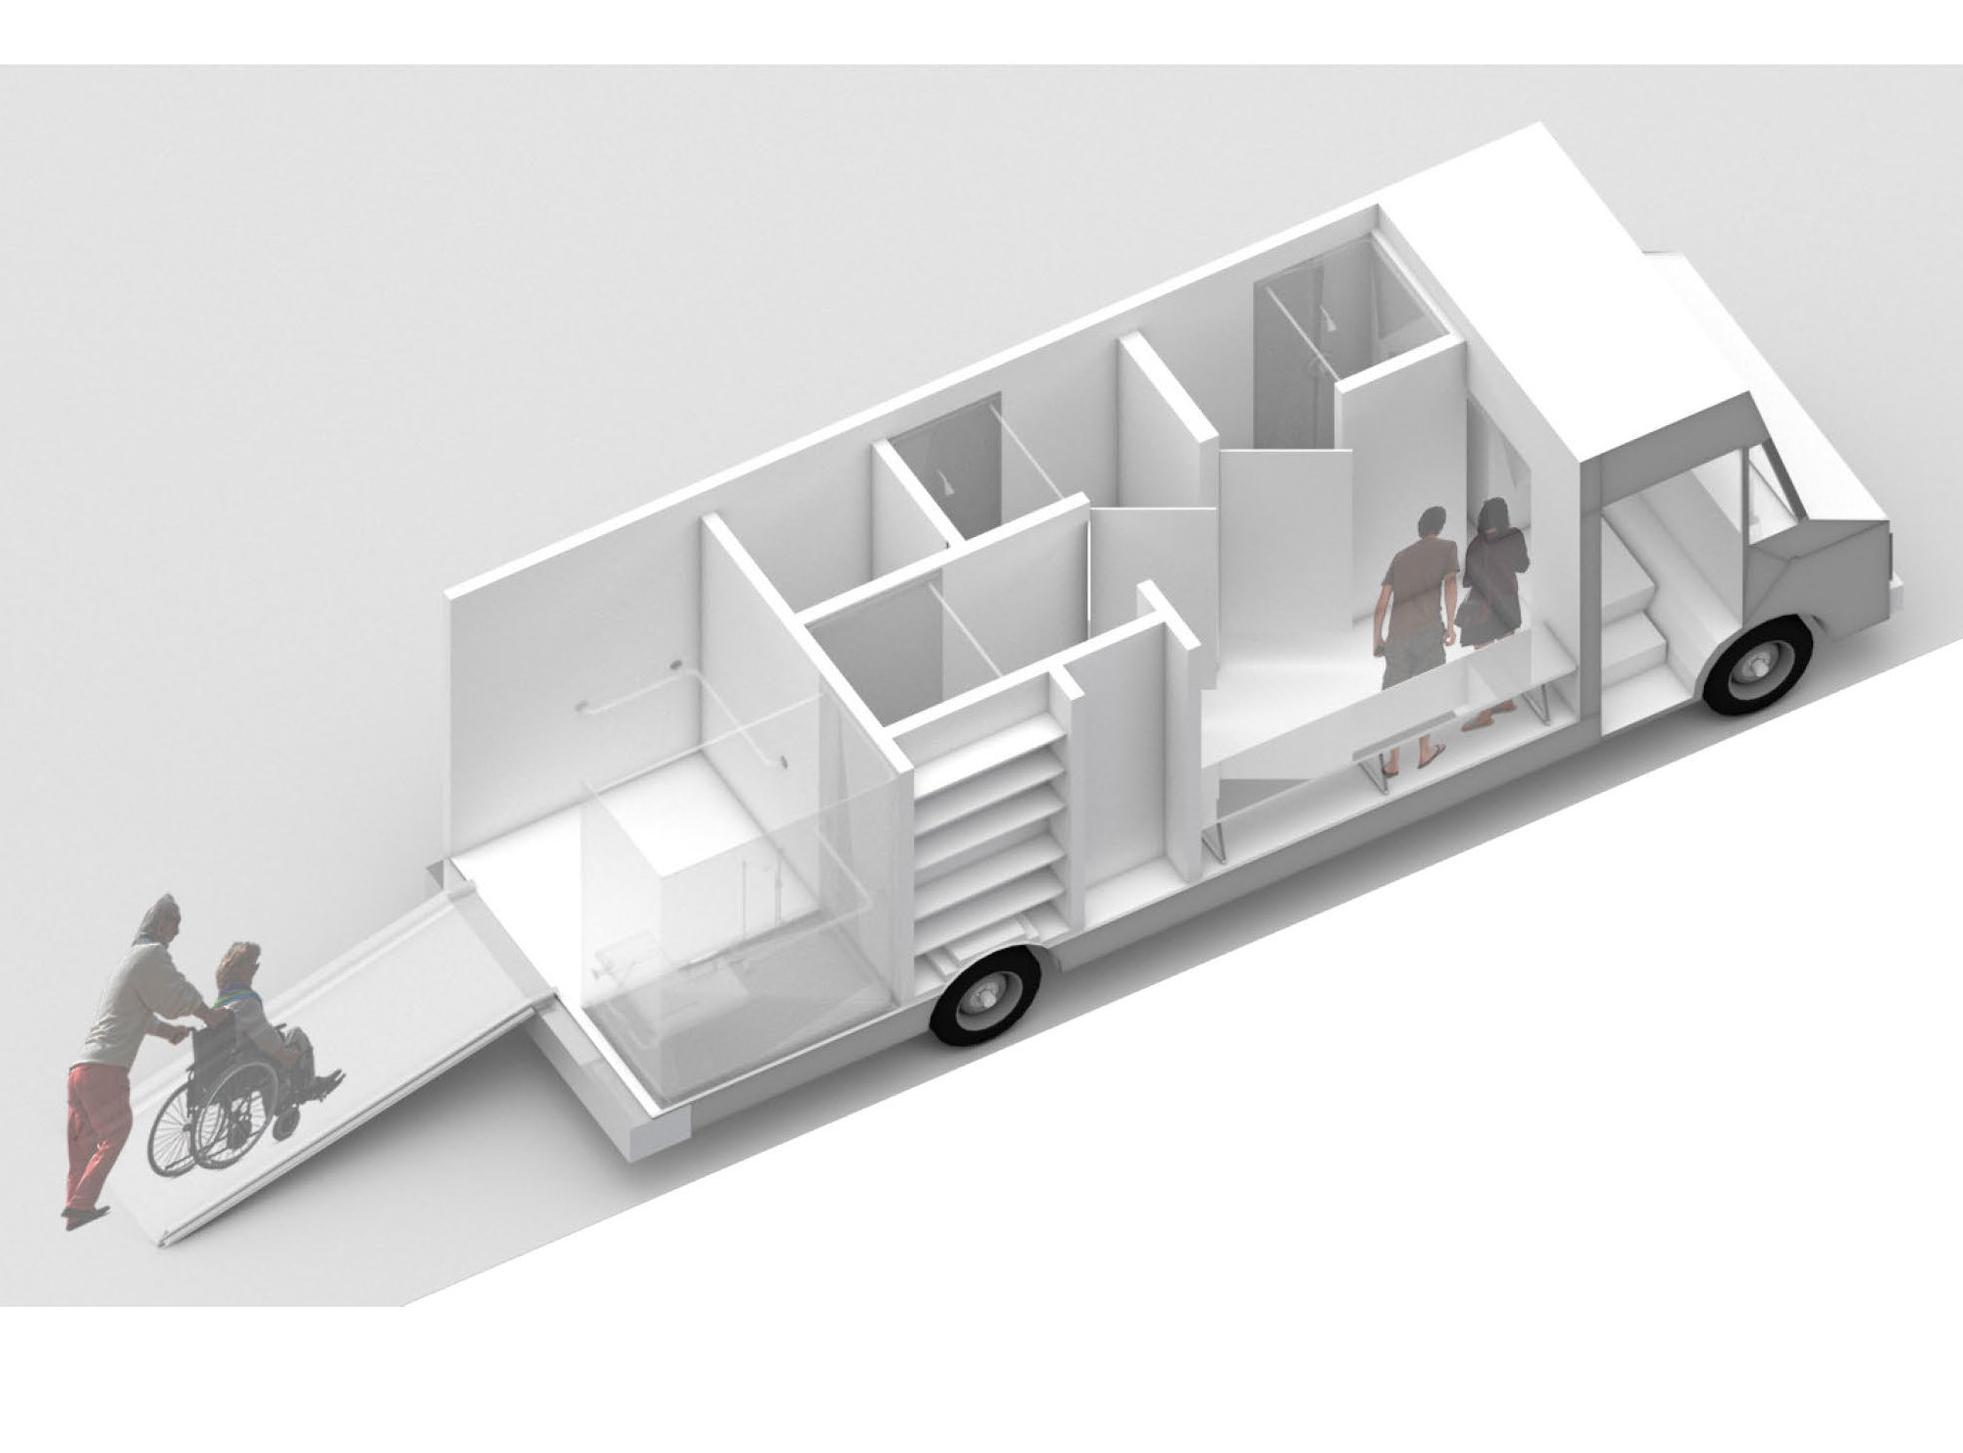 Hygiene Hub Truck Design 10.18.18_Page_5.jpg